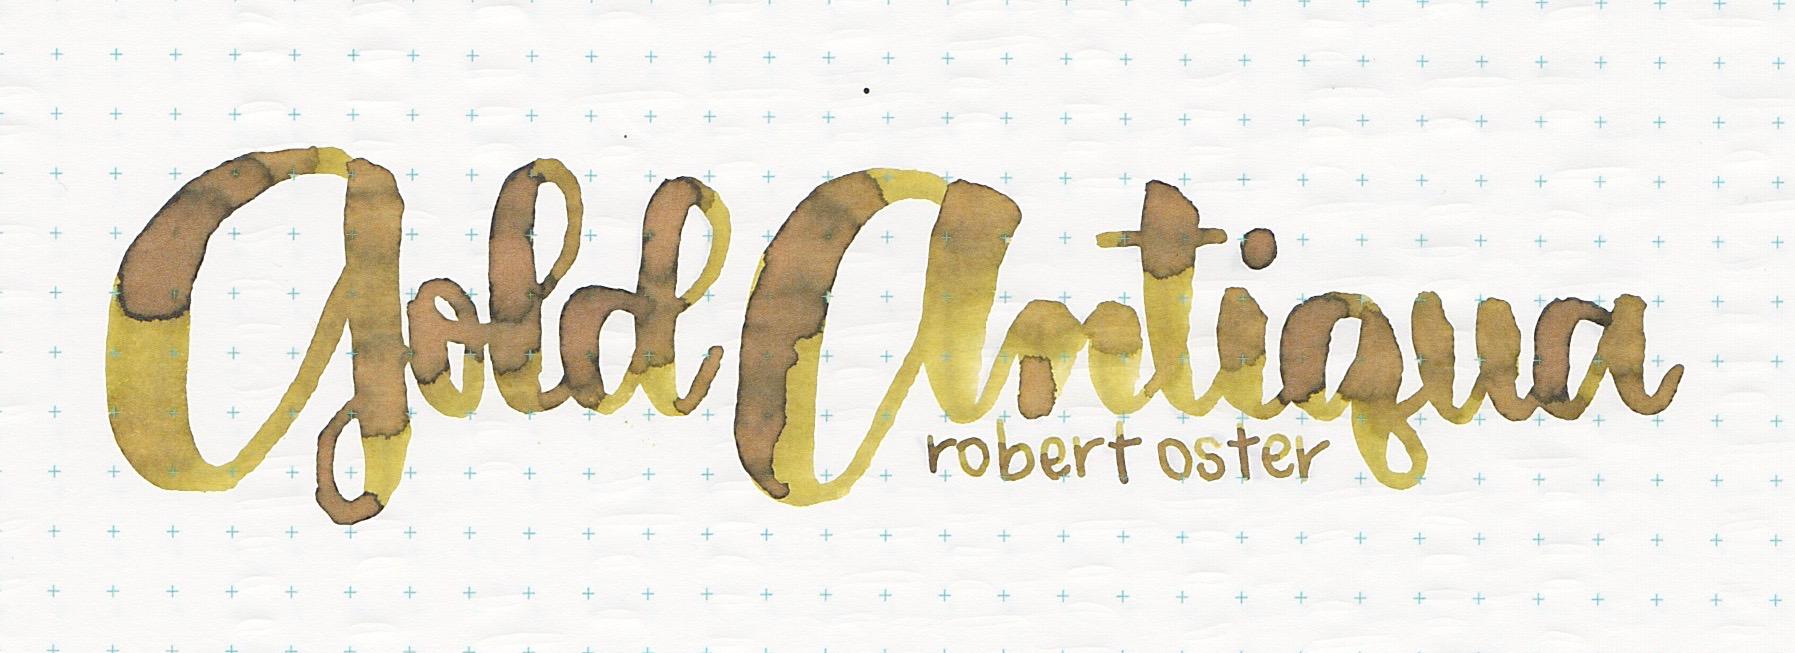 ROGoldAntiqua - 5.jpg